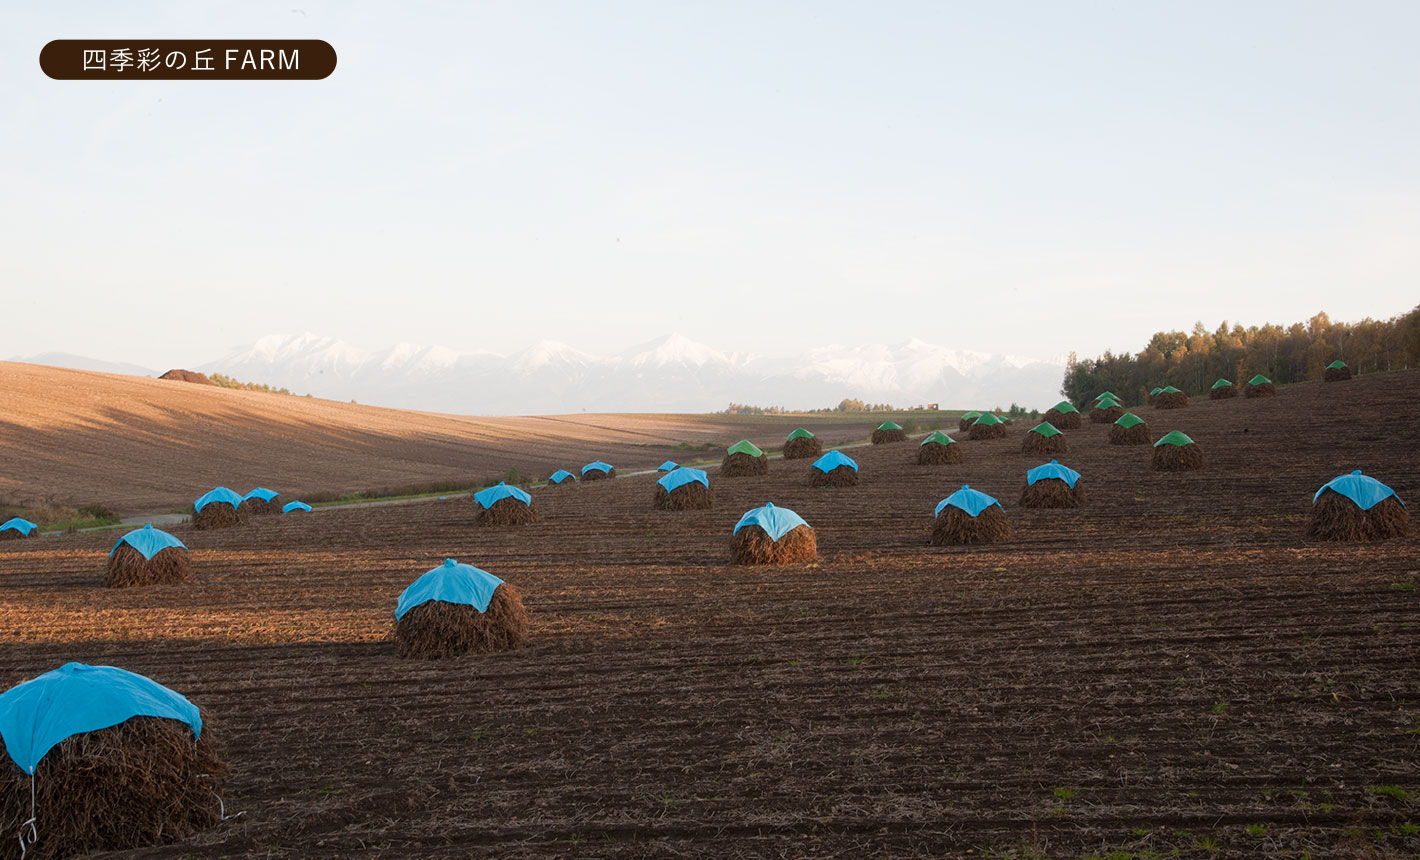 四季彩の丘FARM